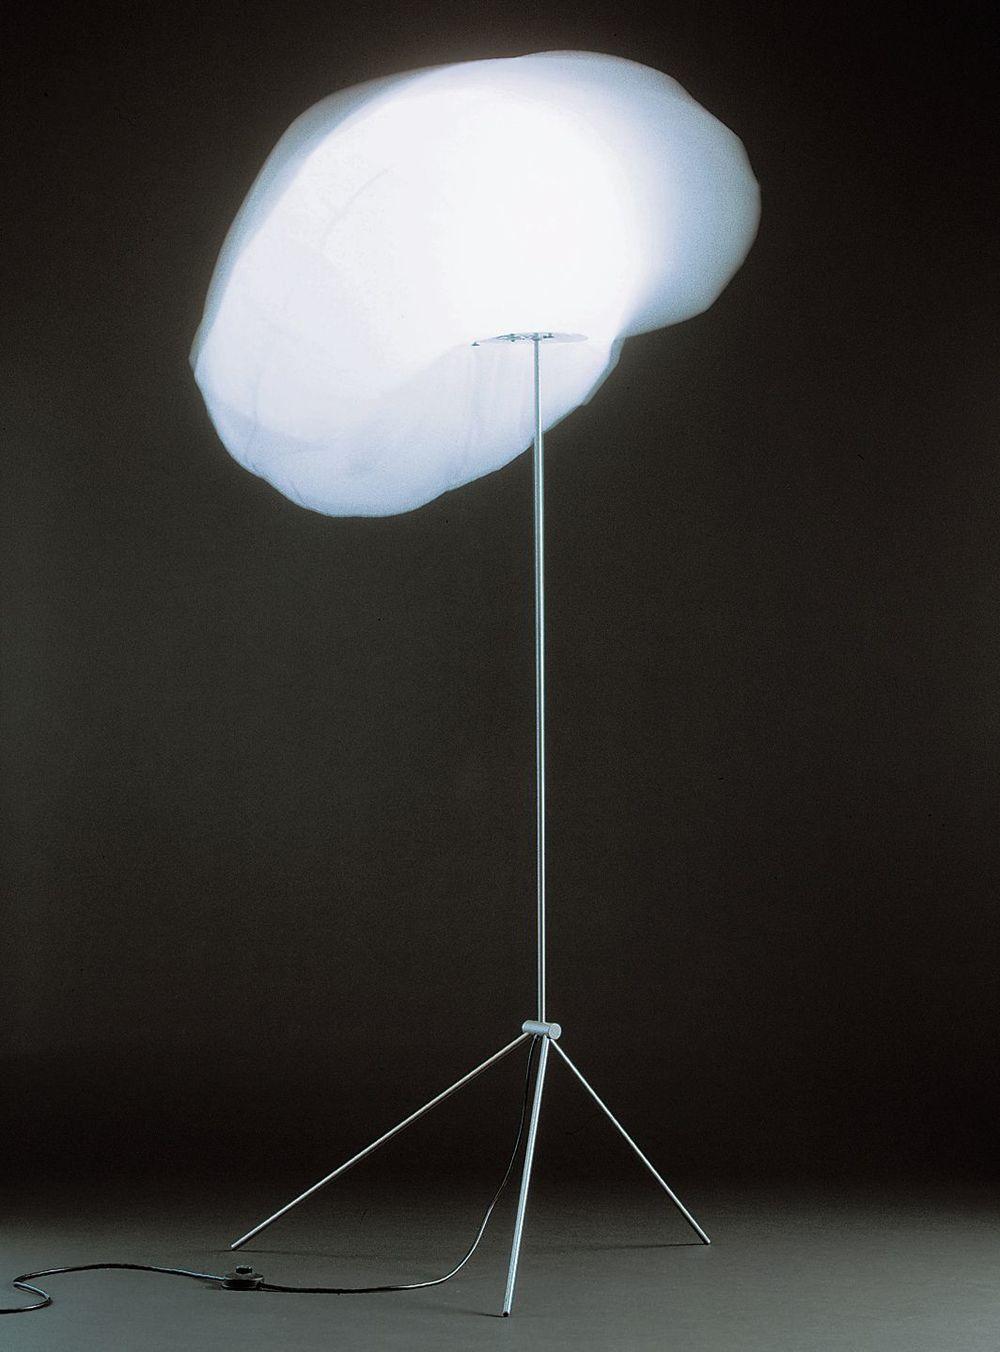 GLOBLOW big floor lamp, designed by Vesa Hinkola, Markus Nevalainen, Rane Vaskivuori / Valvomo